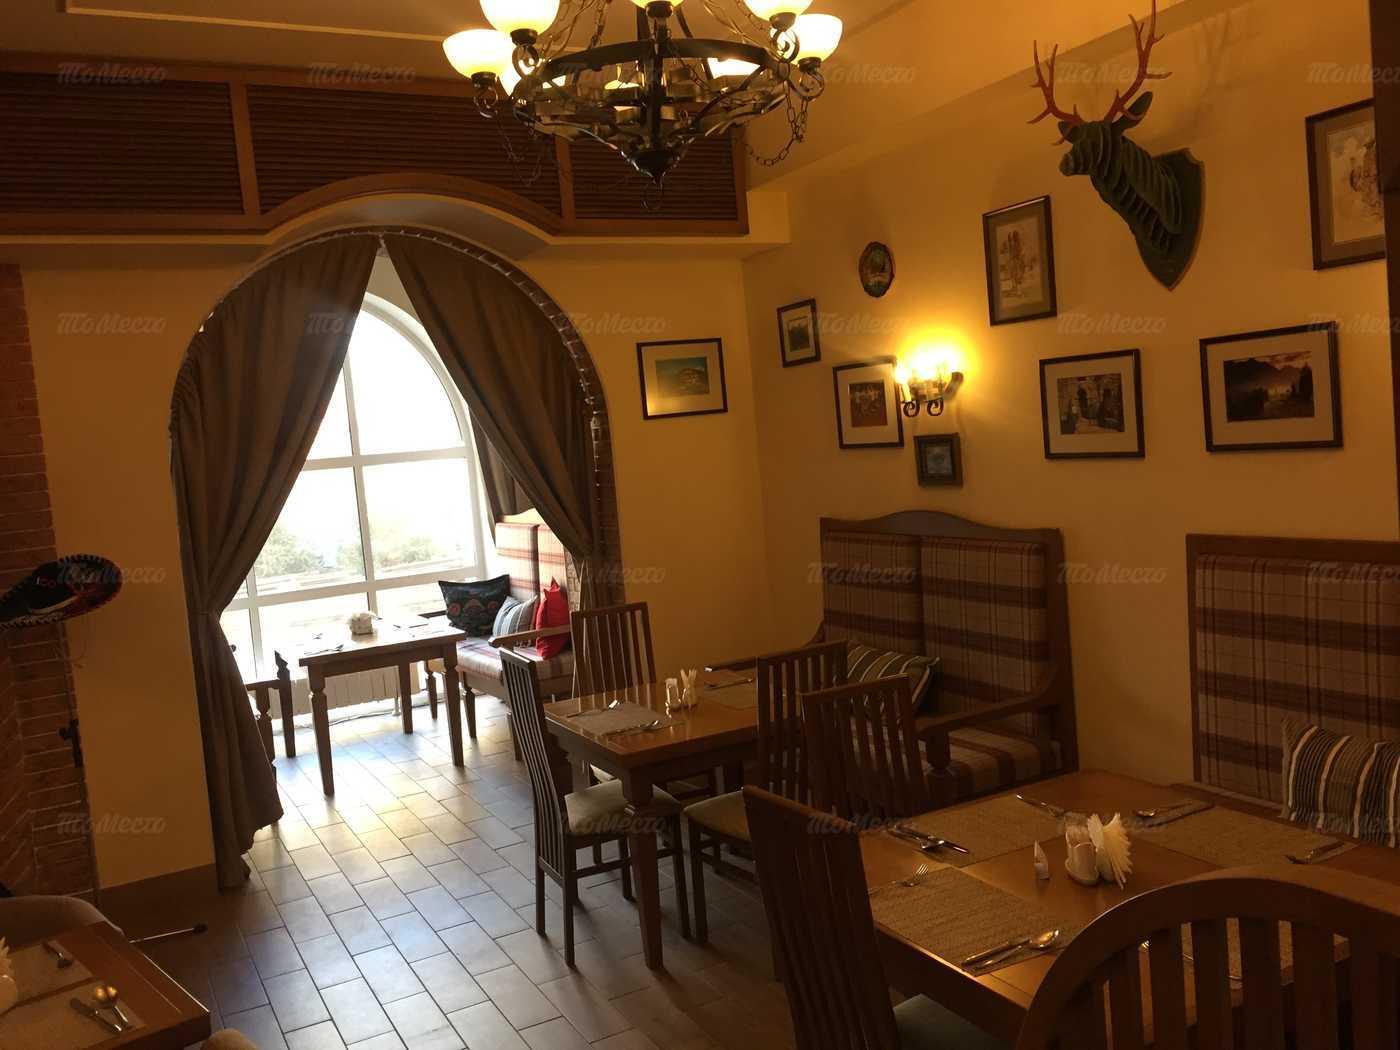 Ресторан Bretzel (Брецель) на улице Химиков фото 10